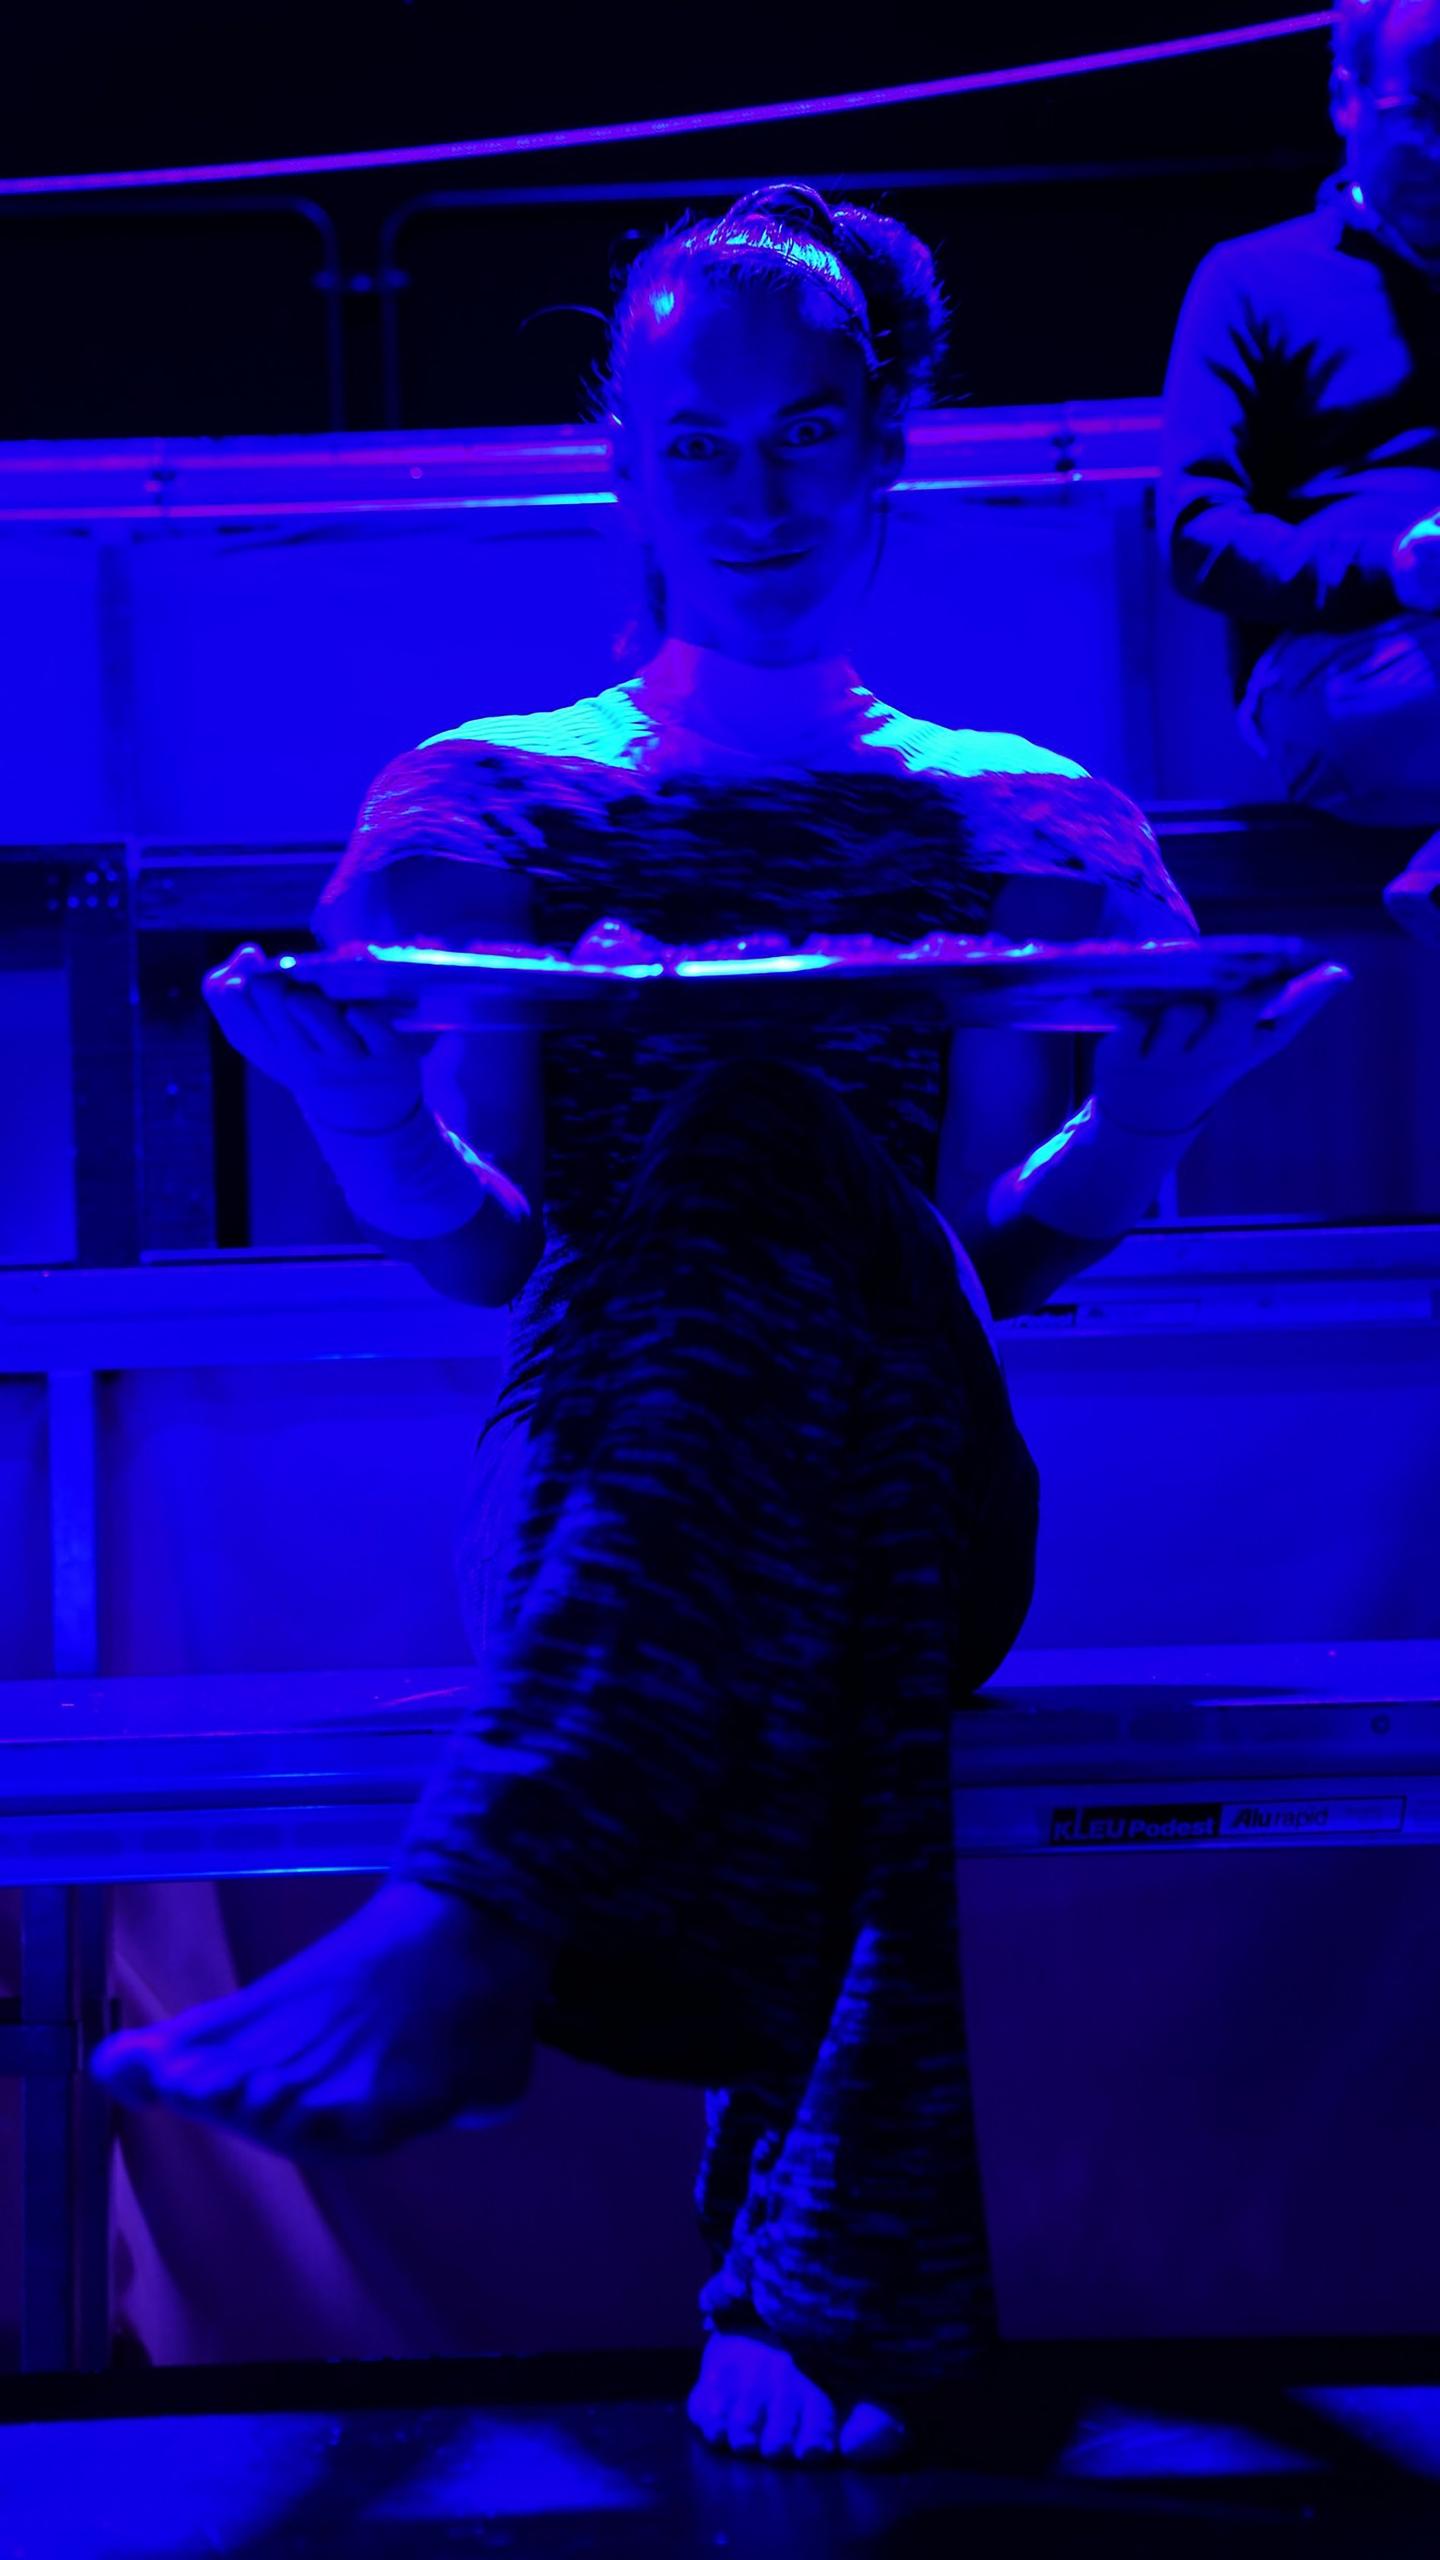 Marcel Gisdol als Amalia, in: »räuber • bachelor • paradise« von Julian Mahid Carly nach Friedrich Schiller Regie:Julian Mahid Carly